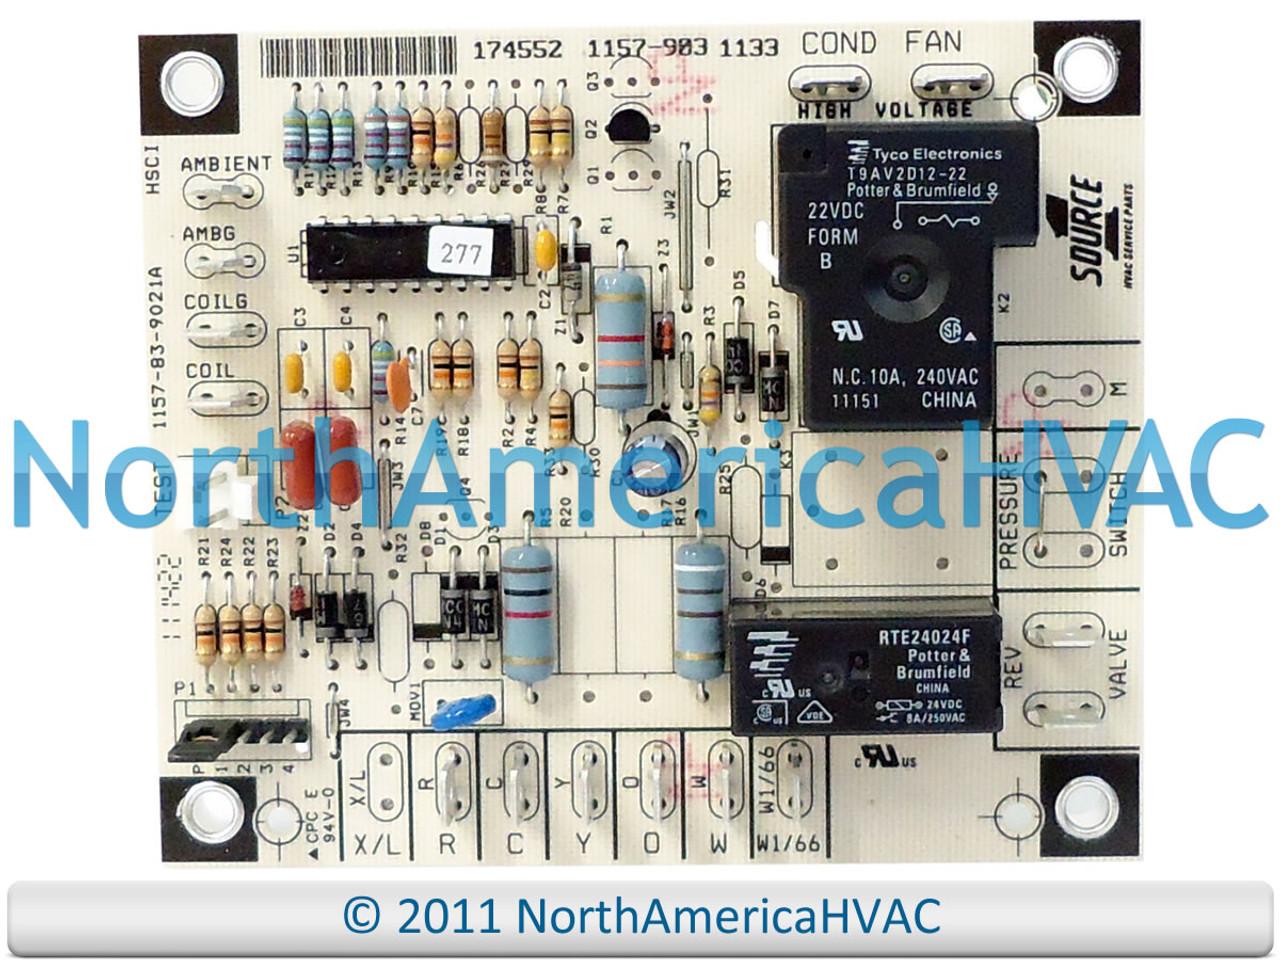 67297 Source 1 OEM Heat Pump Defrost Control Circuit Board